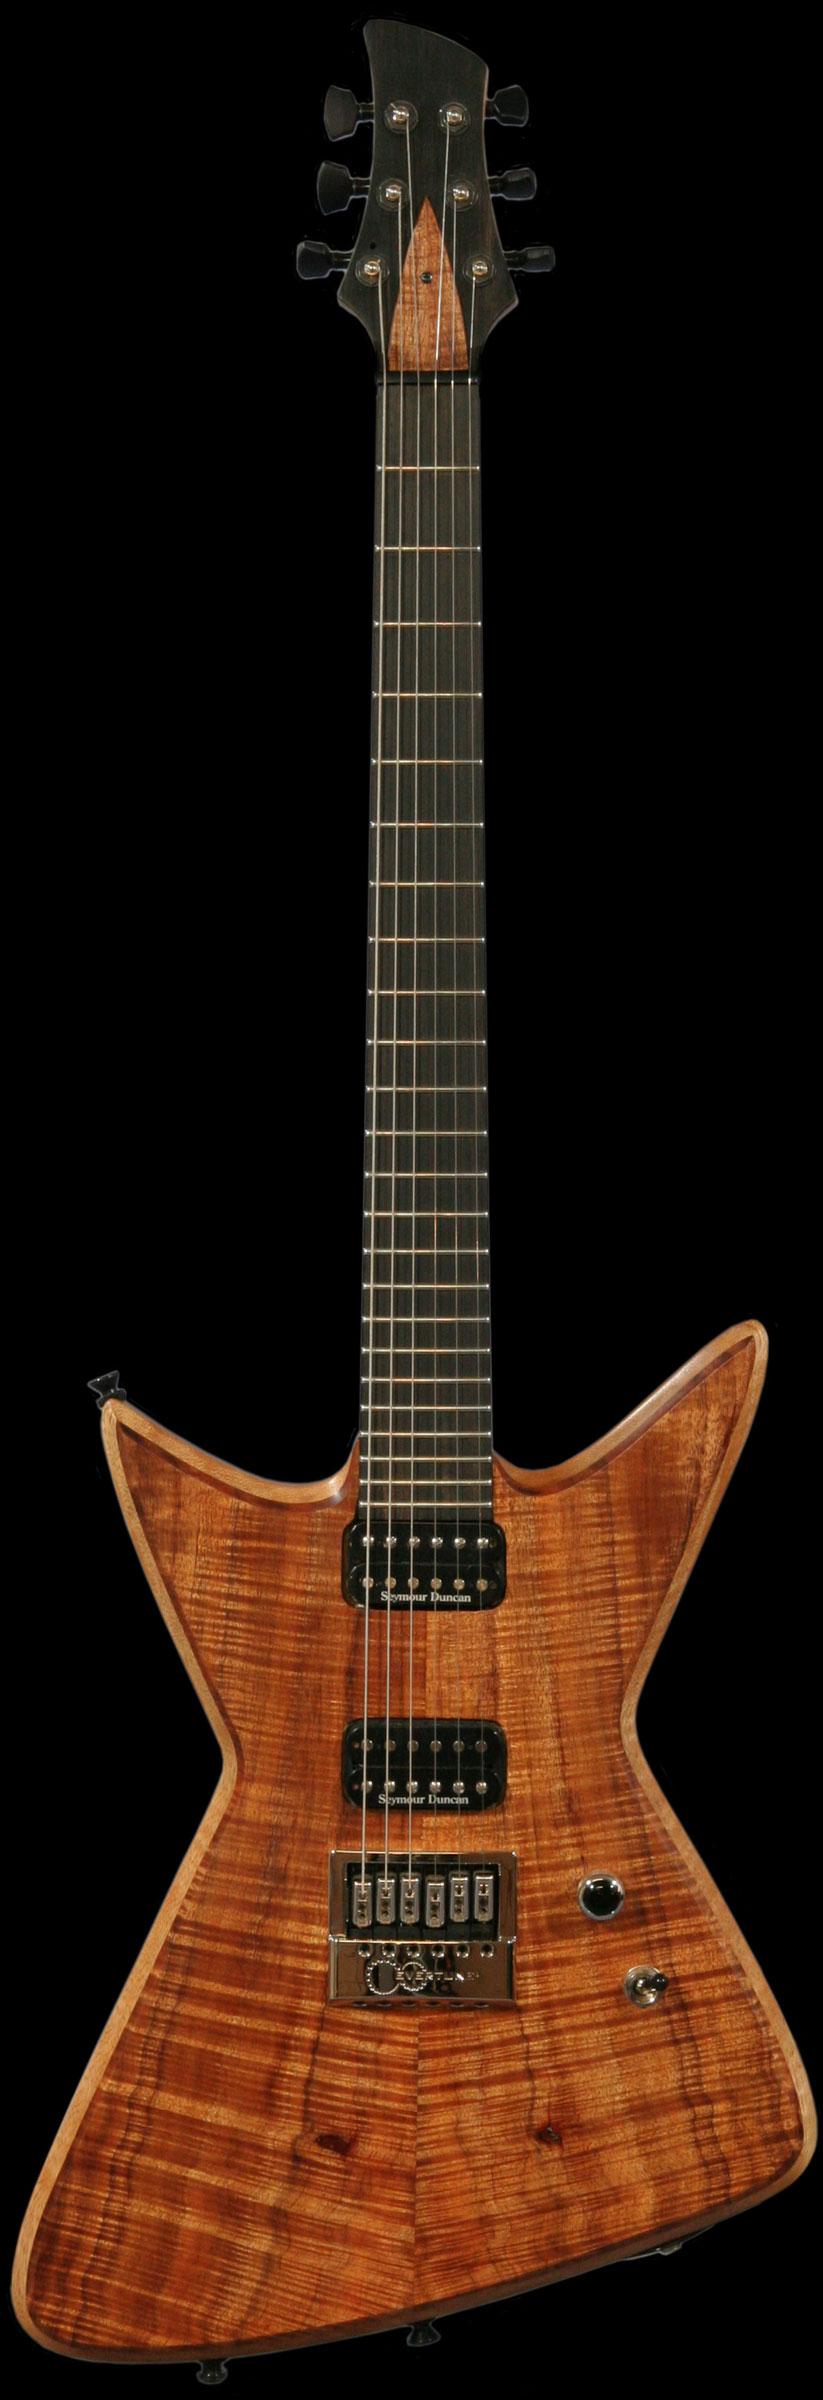 bertram nova guitar white korina and koa top custom guitar with evertune bridge. Black Bedroom Furniture Sets. Home Design Ideas